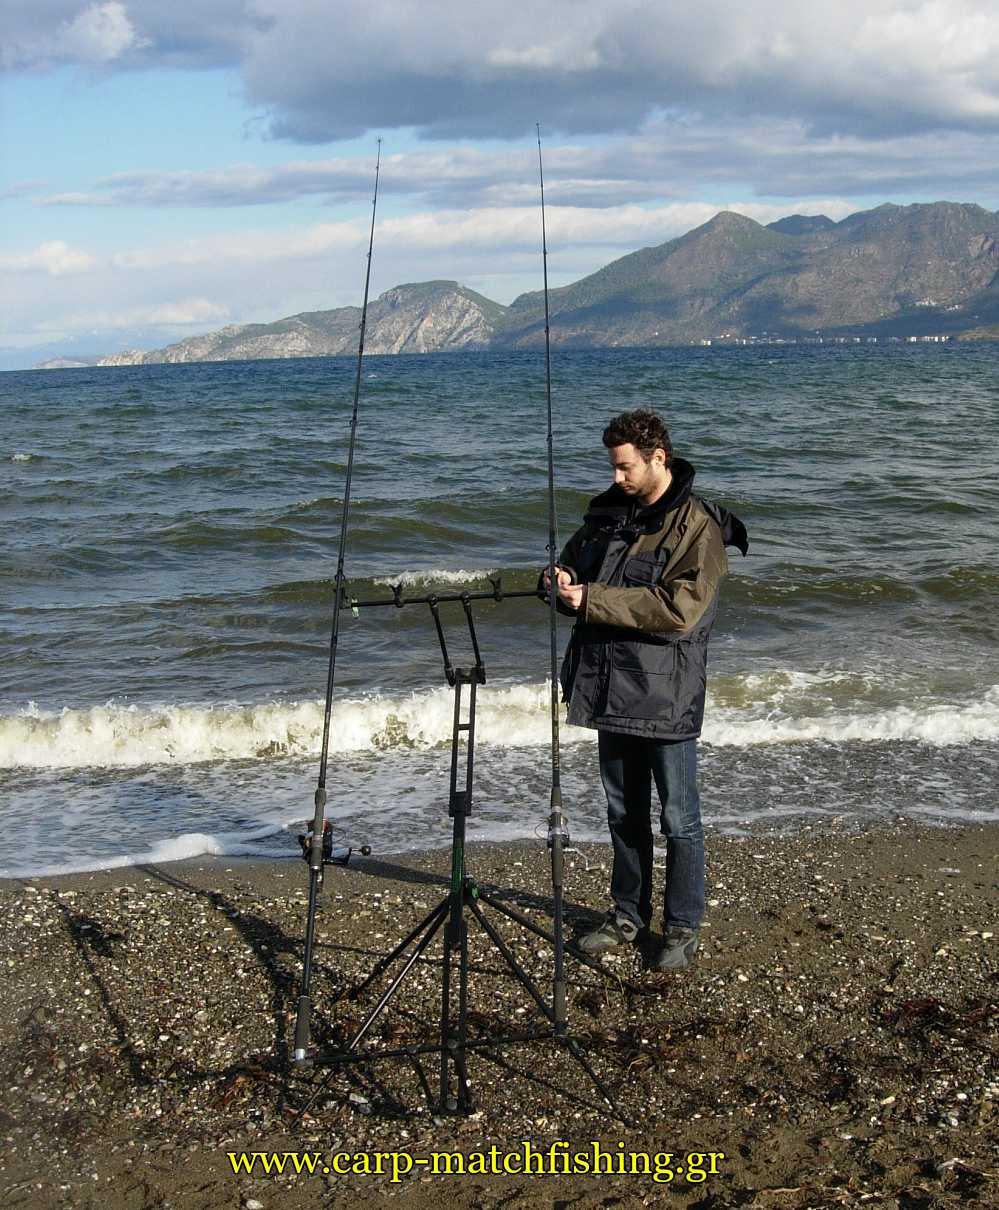 rod-pod-sea-buzzers-carpmatchfishing